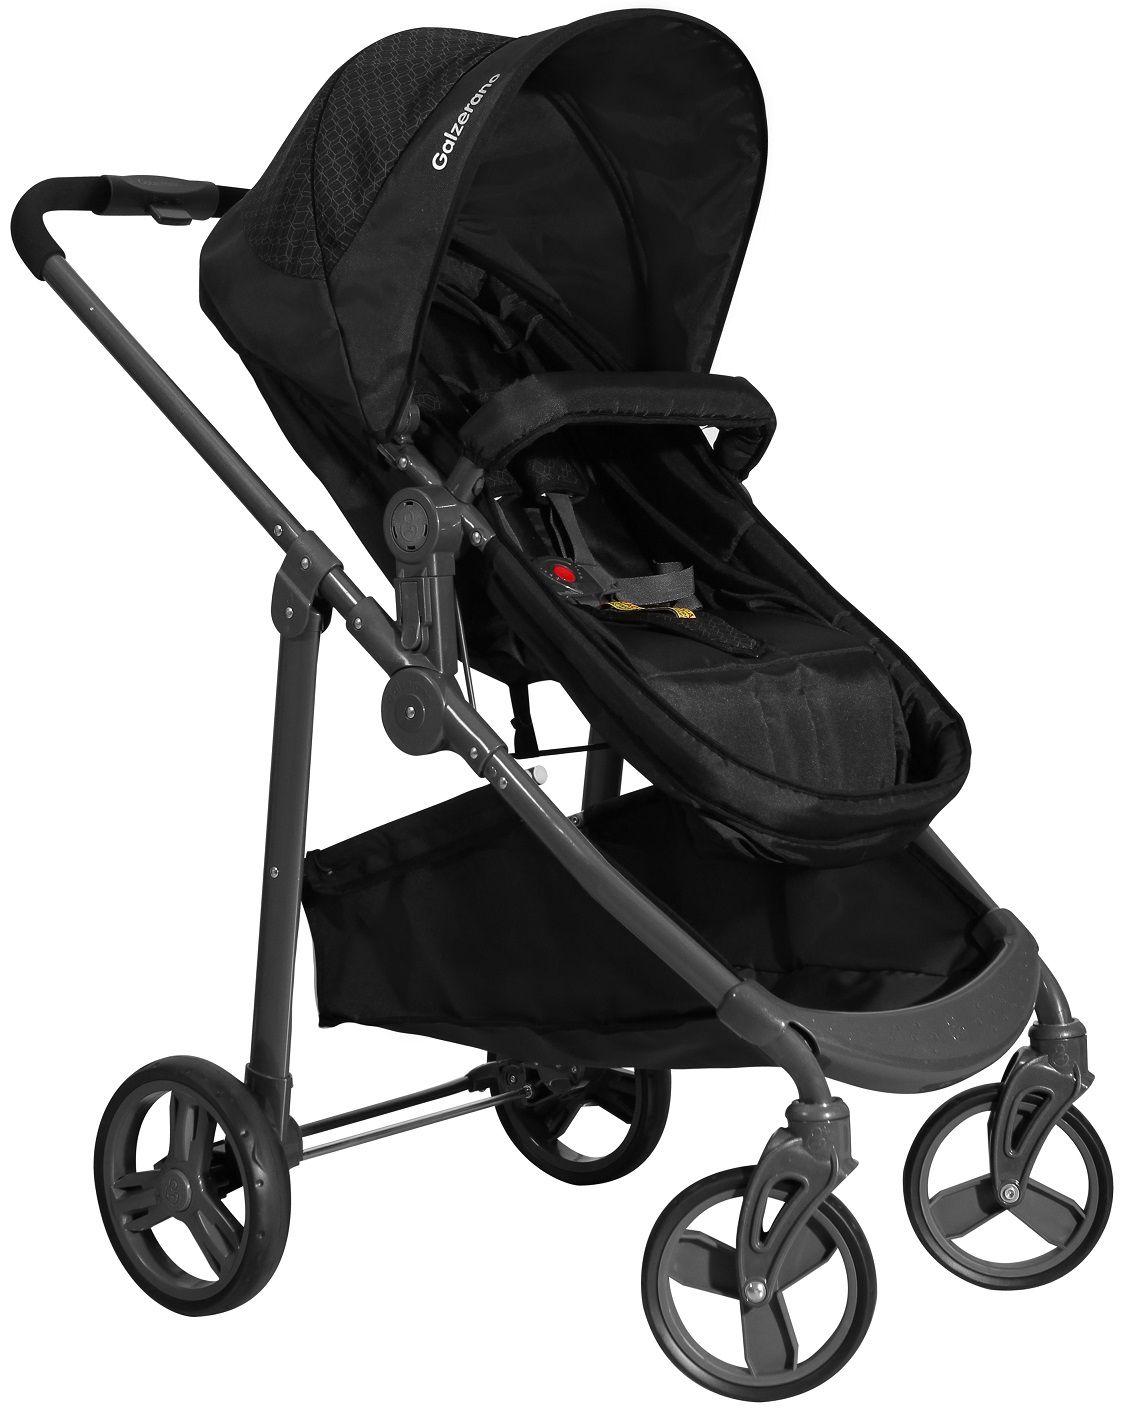 Carrinho de Bebê Olympus Preto + Bebê Conforto + Base - Galzerano